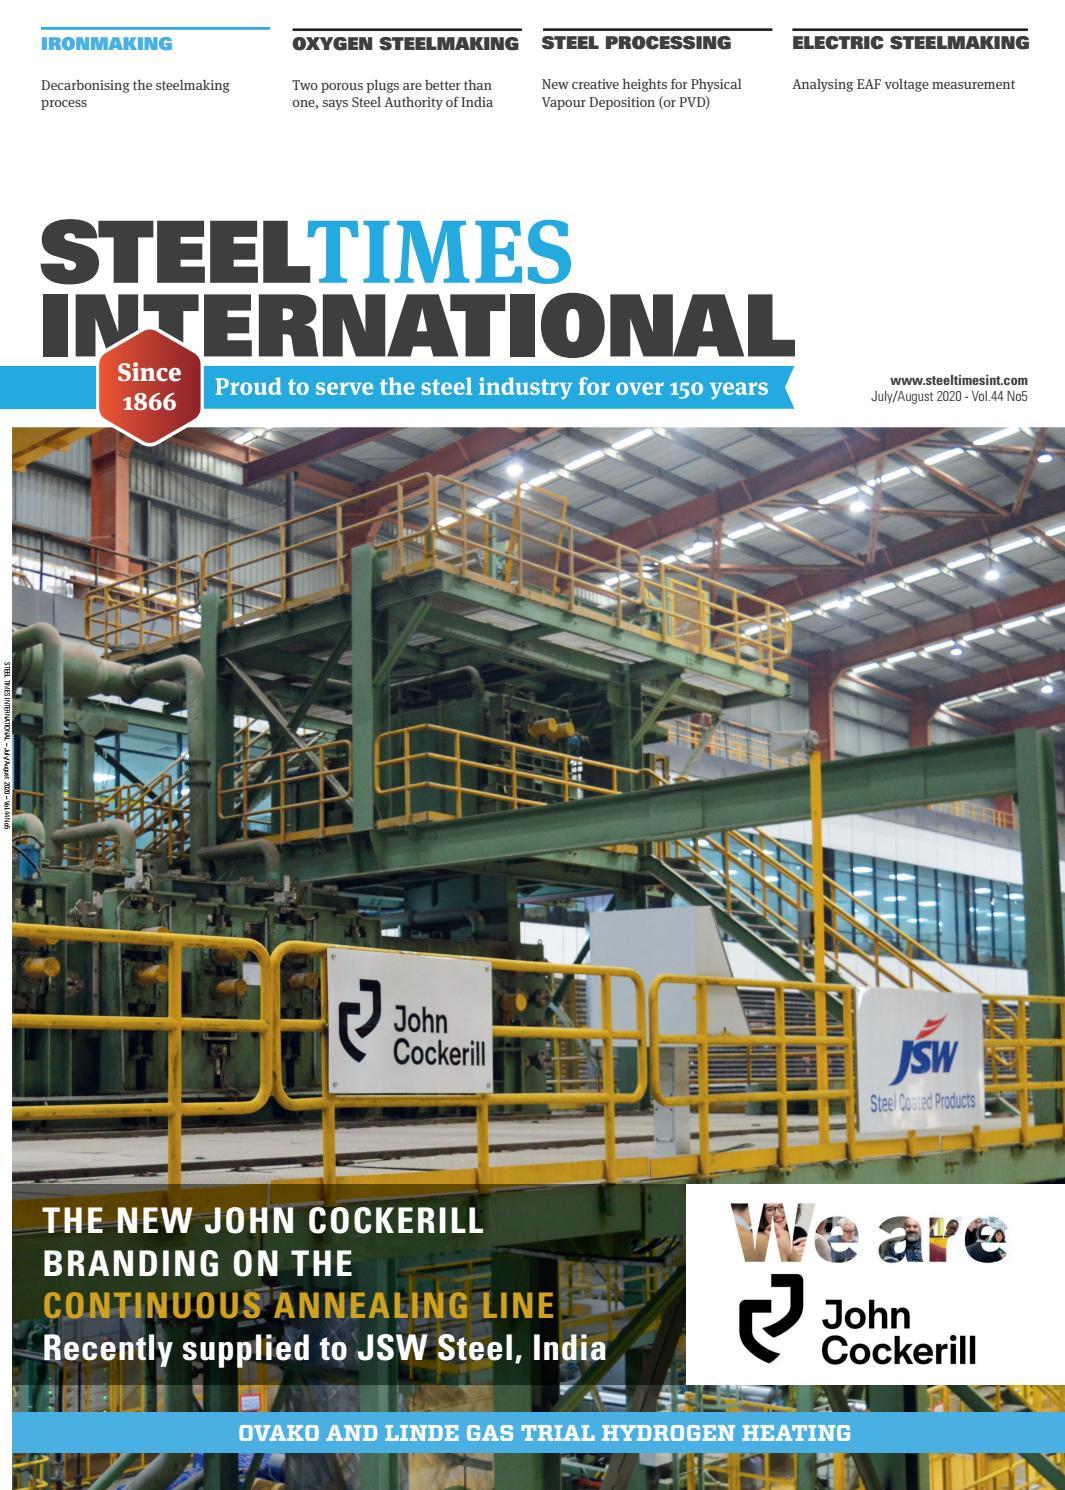 Steel Times International July August 2020 By Quartz Business Media Issuu